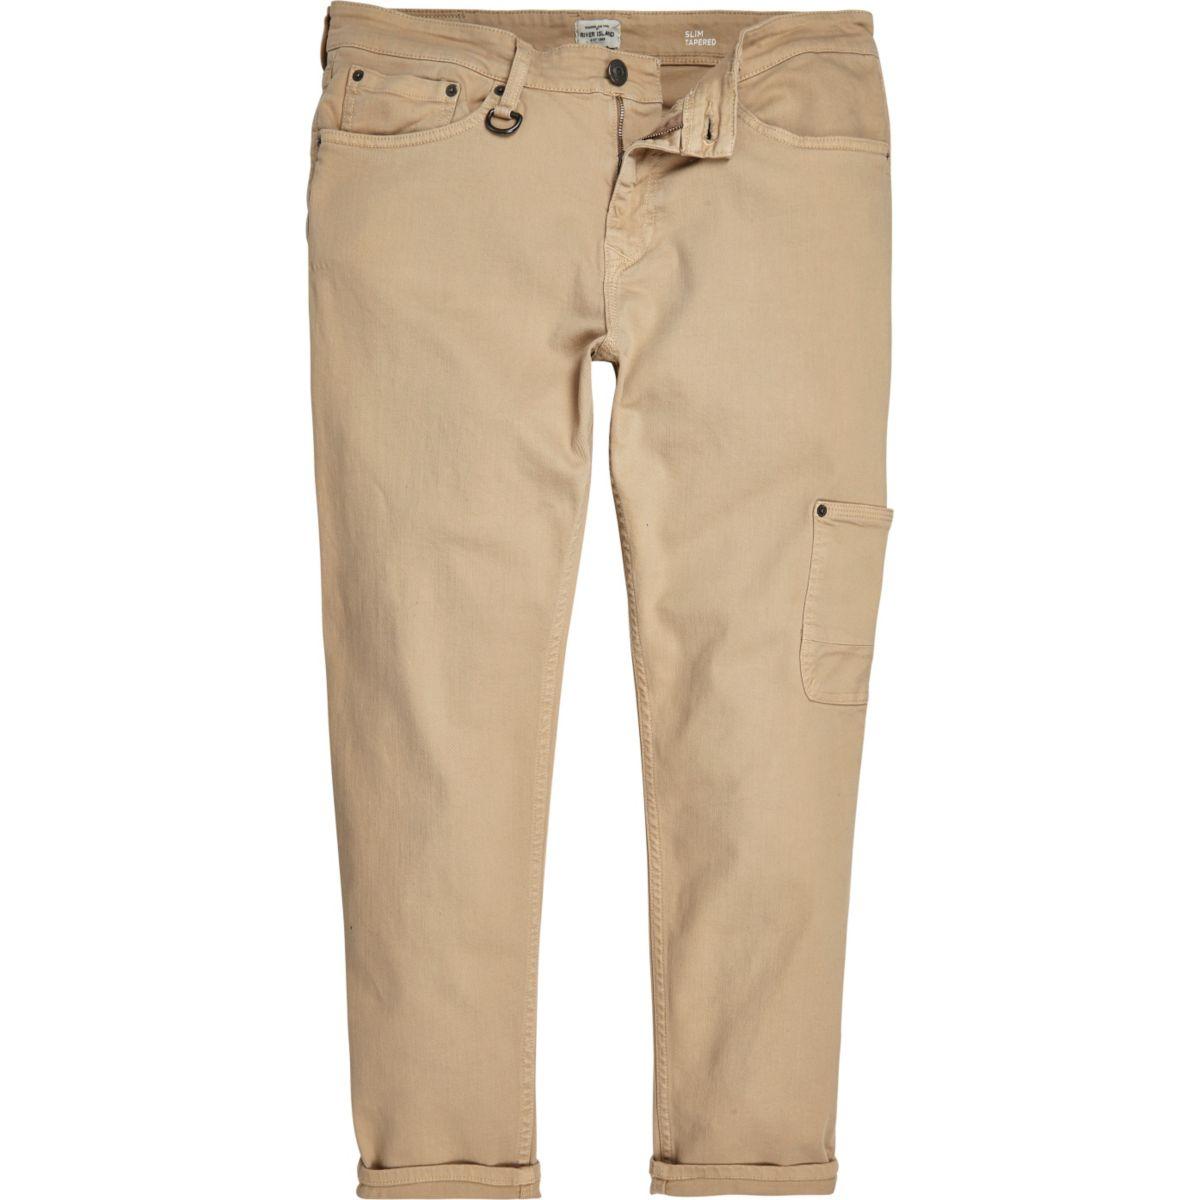 Tan Jimmy slim tapered pants